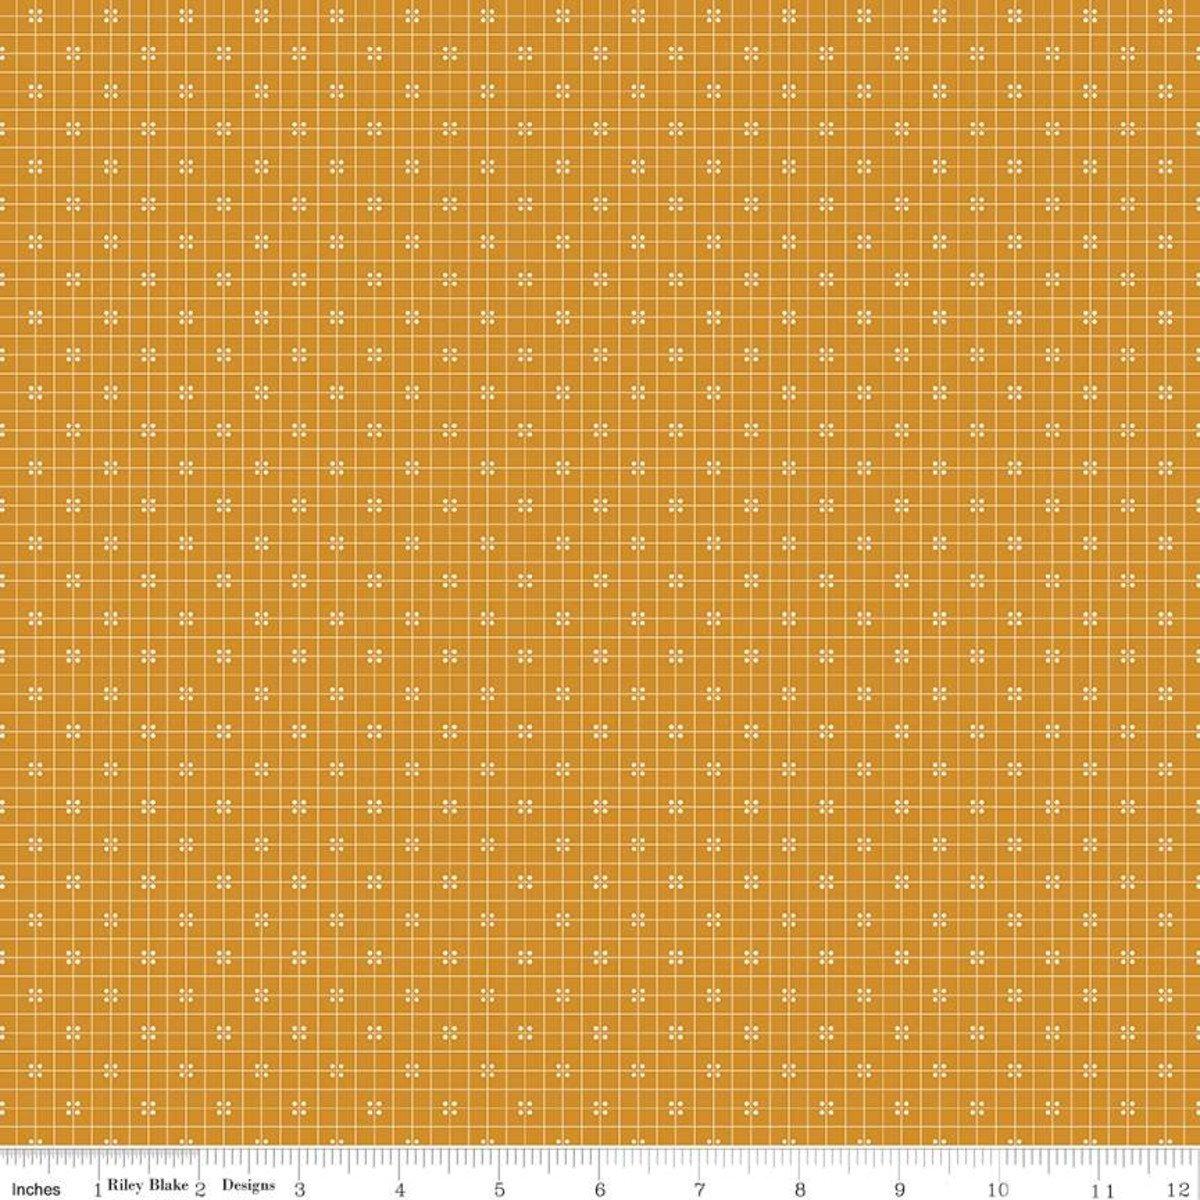 Prim C9701 Plaid Butterscotch by Lori Holt for Riley Blake Designs